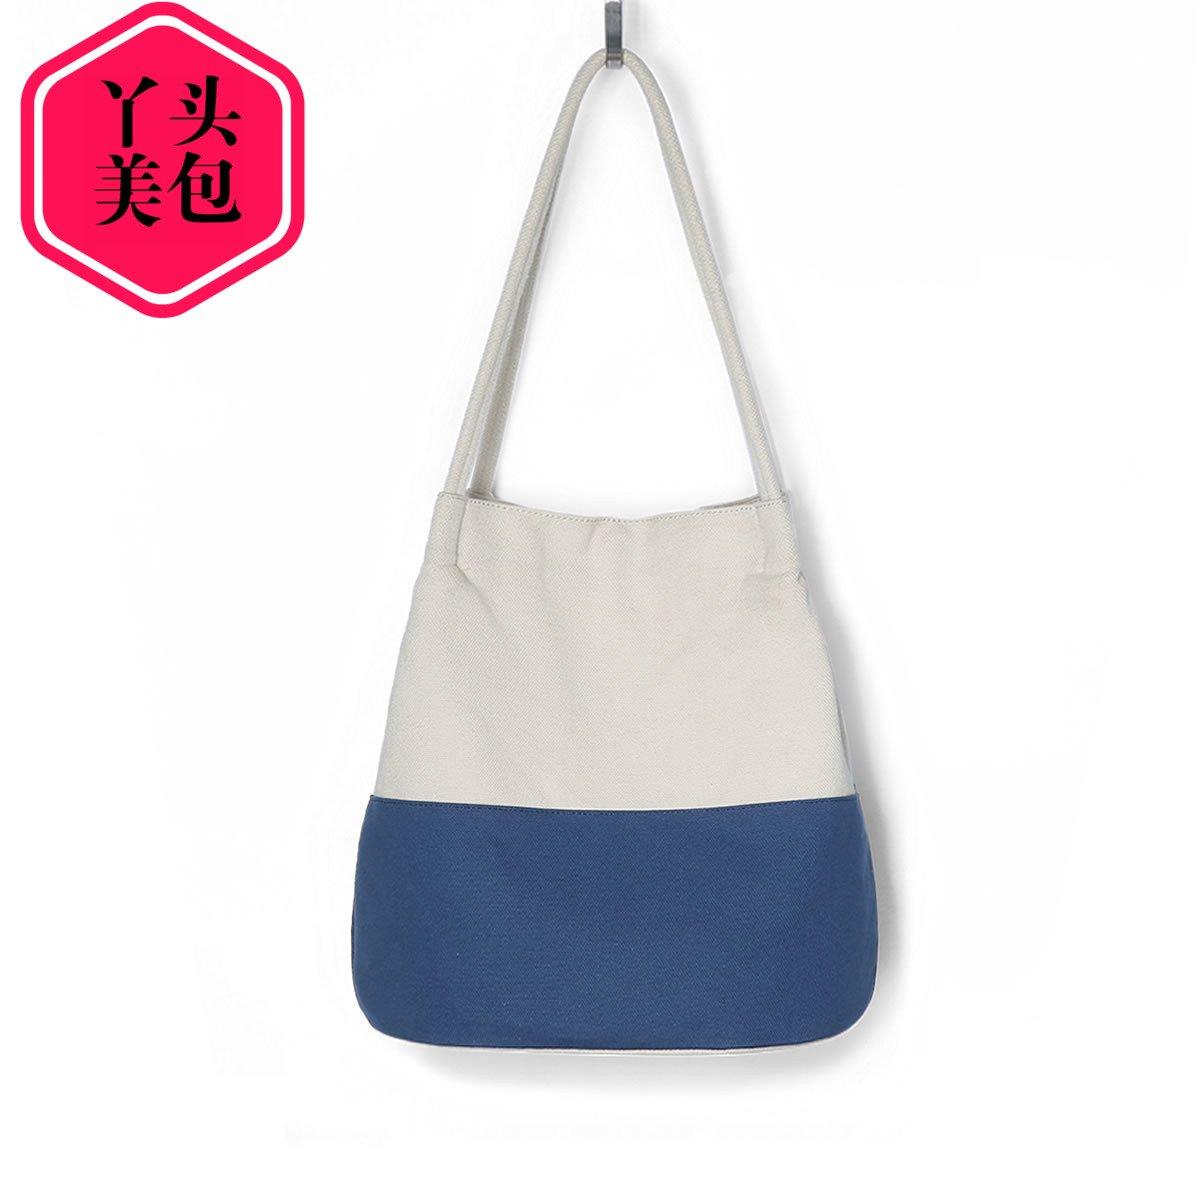 Women canvas bucket bag tote bag